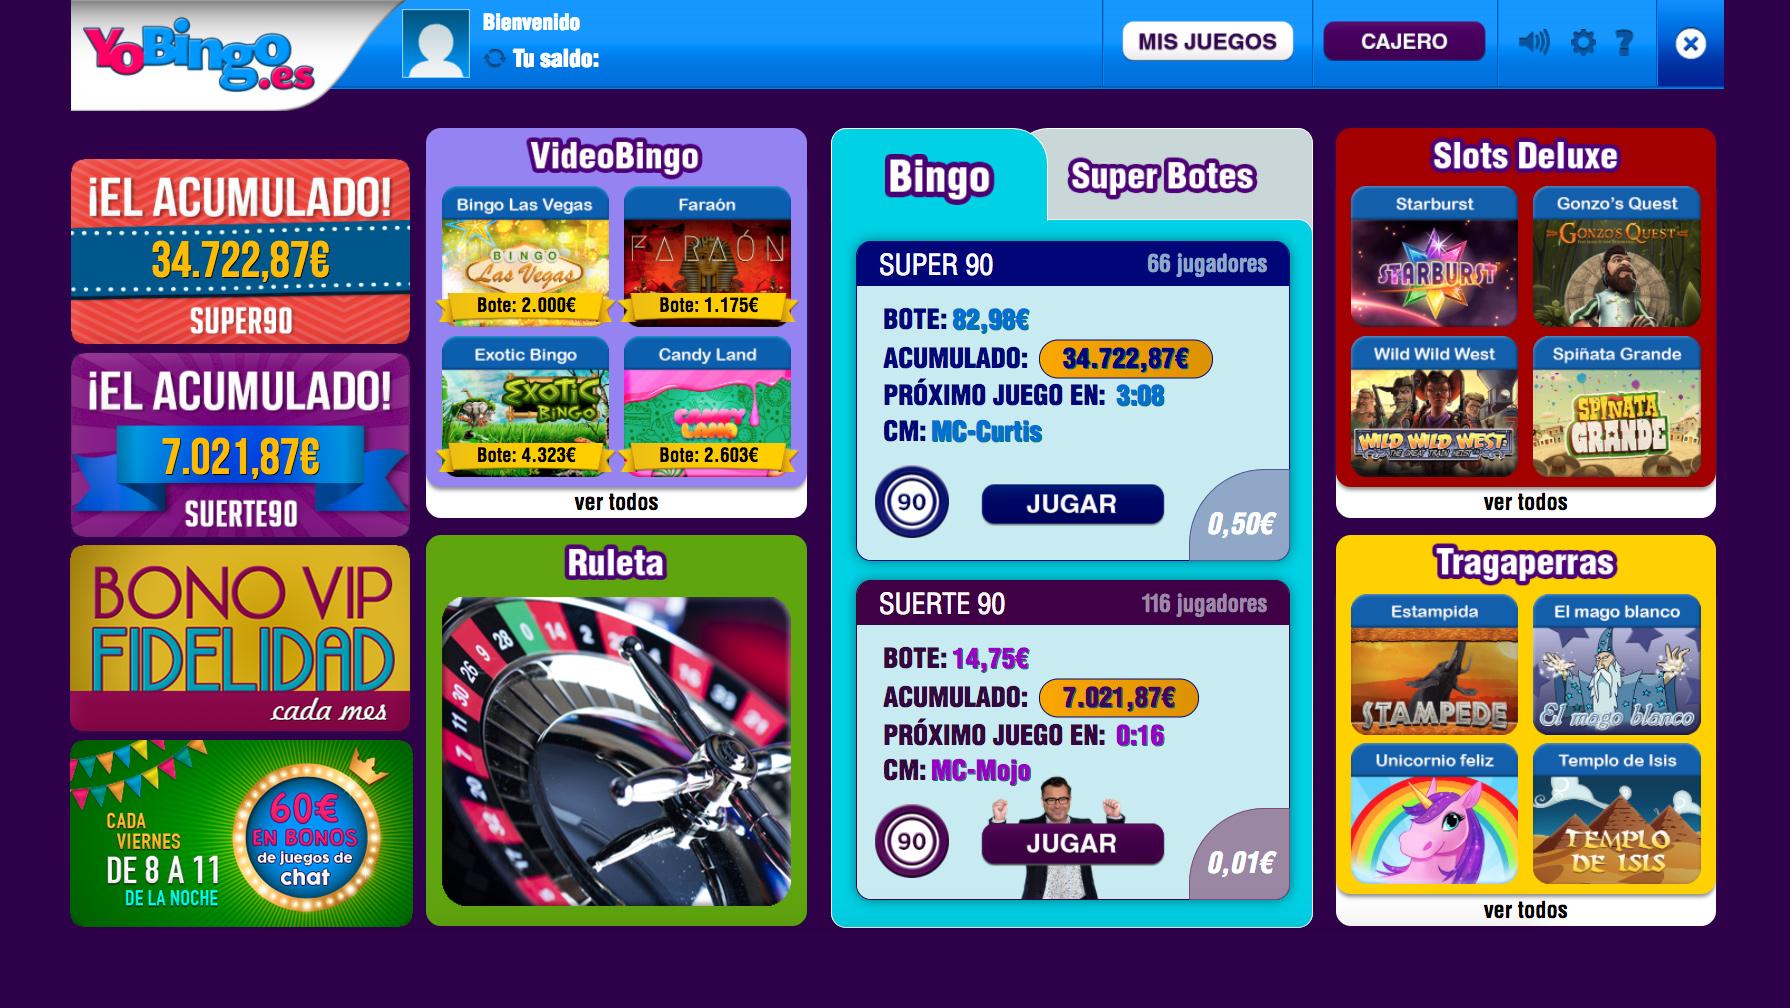 Juegos house of fun 187 Live casino-334989